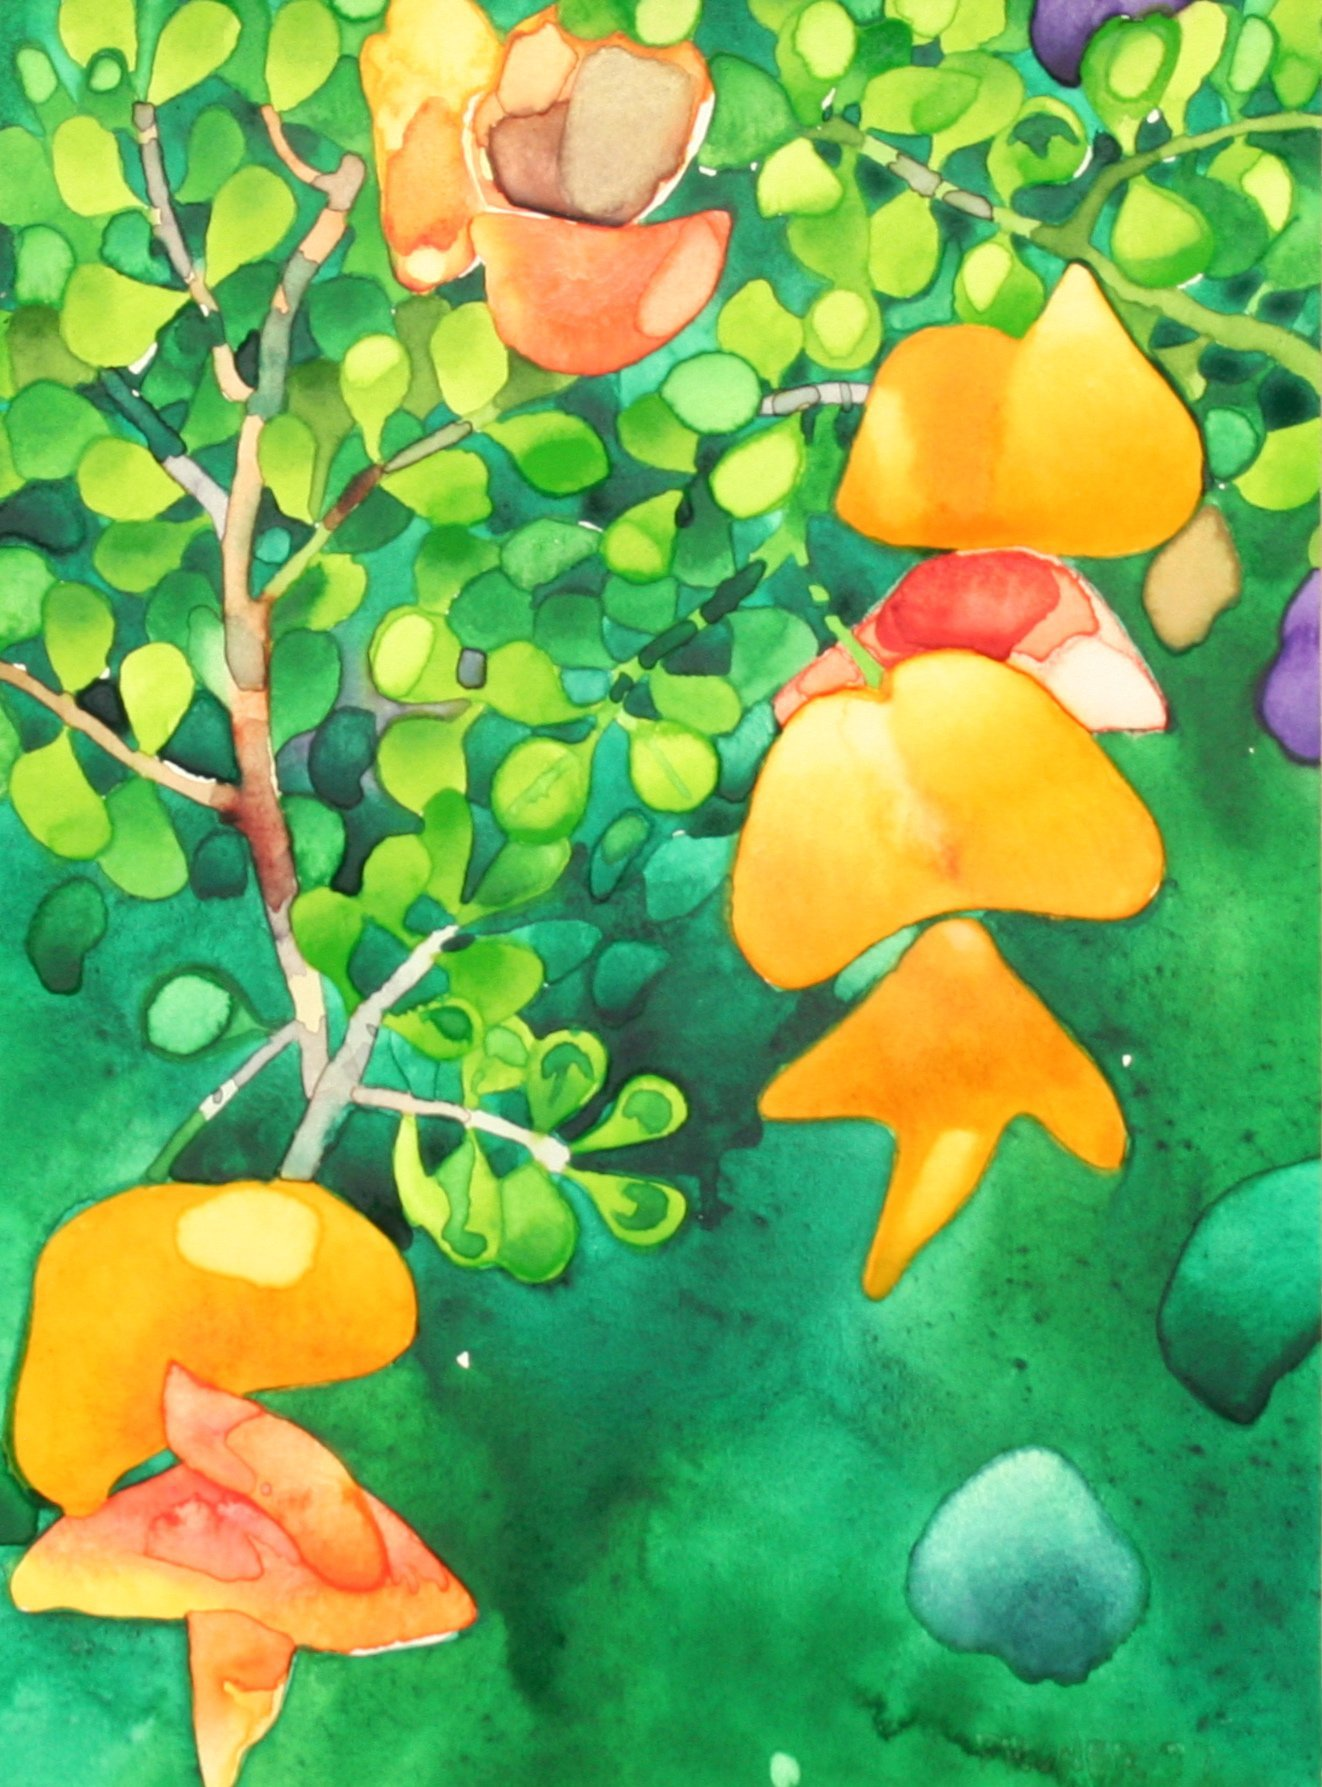 Pruner, Gary – Bladder Flower II